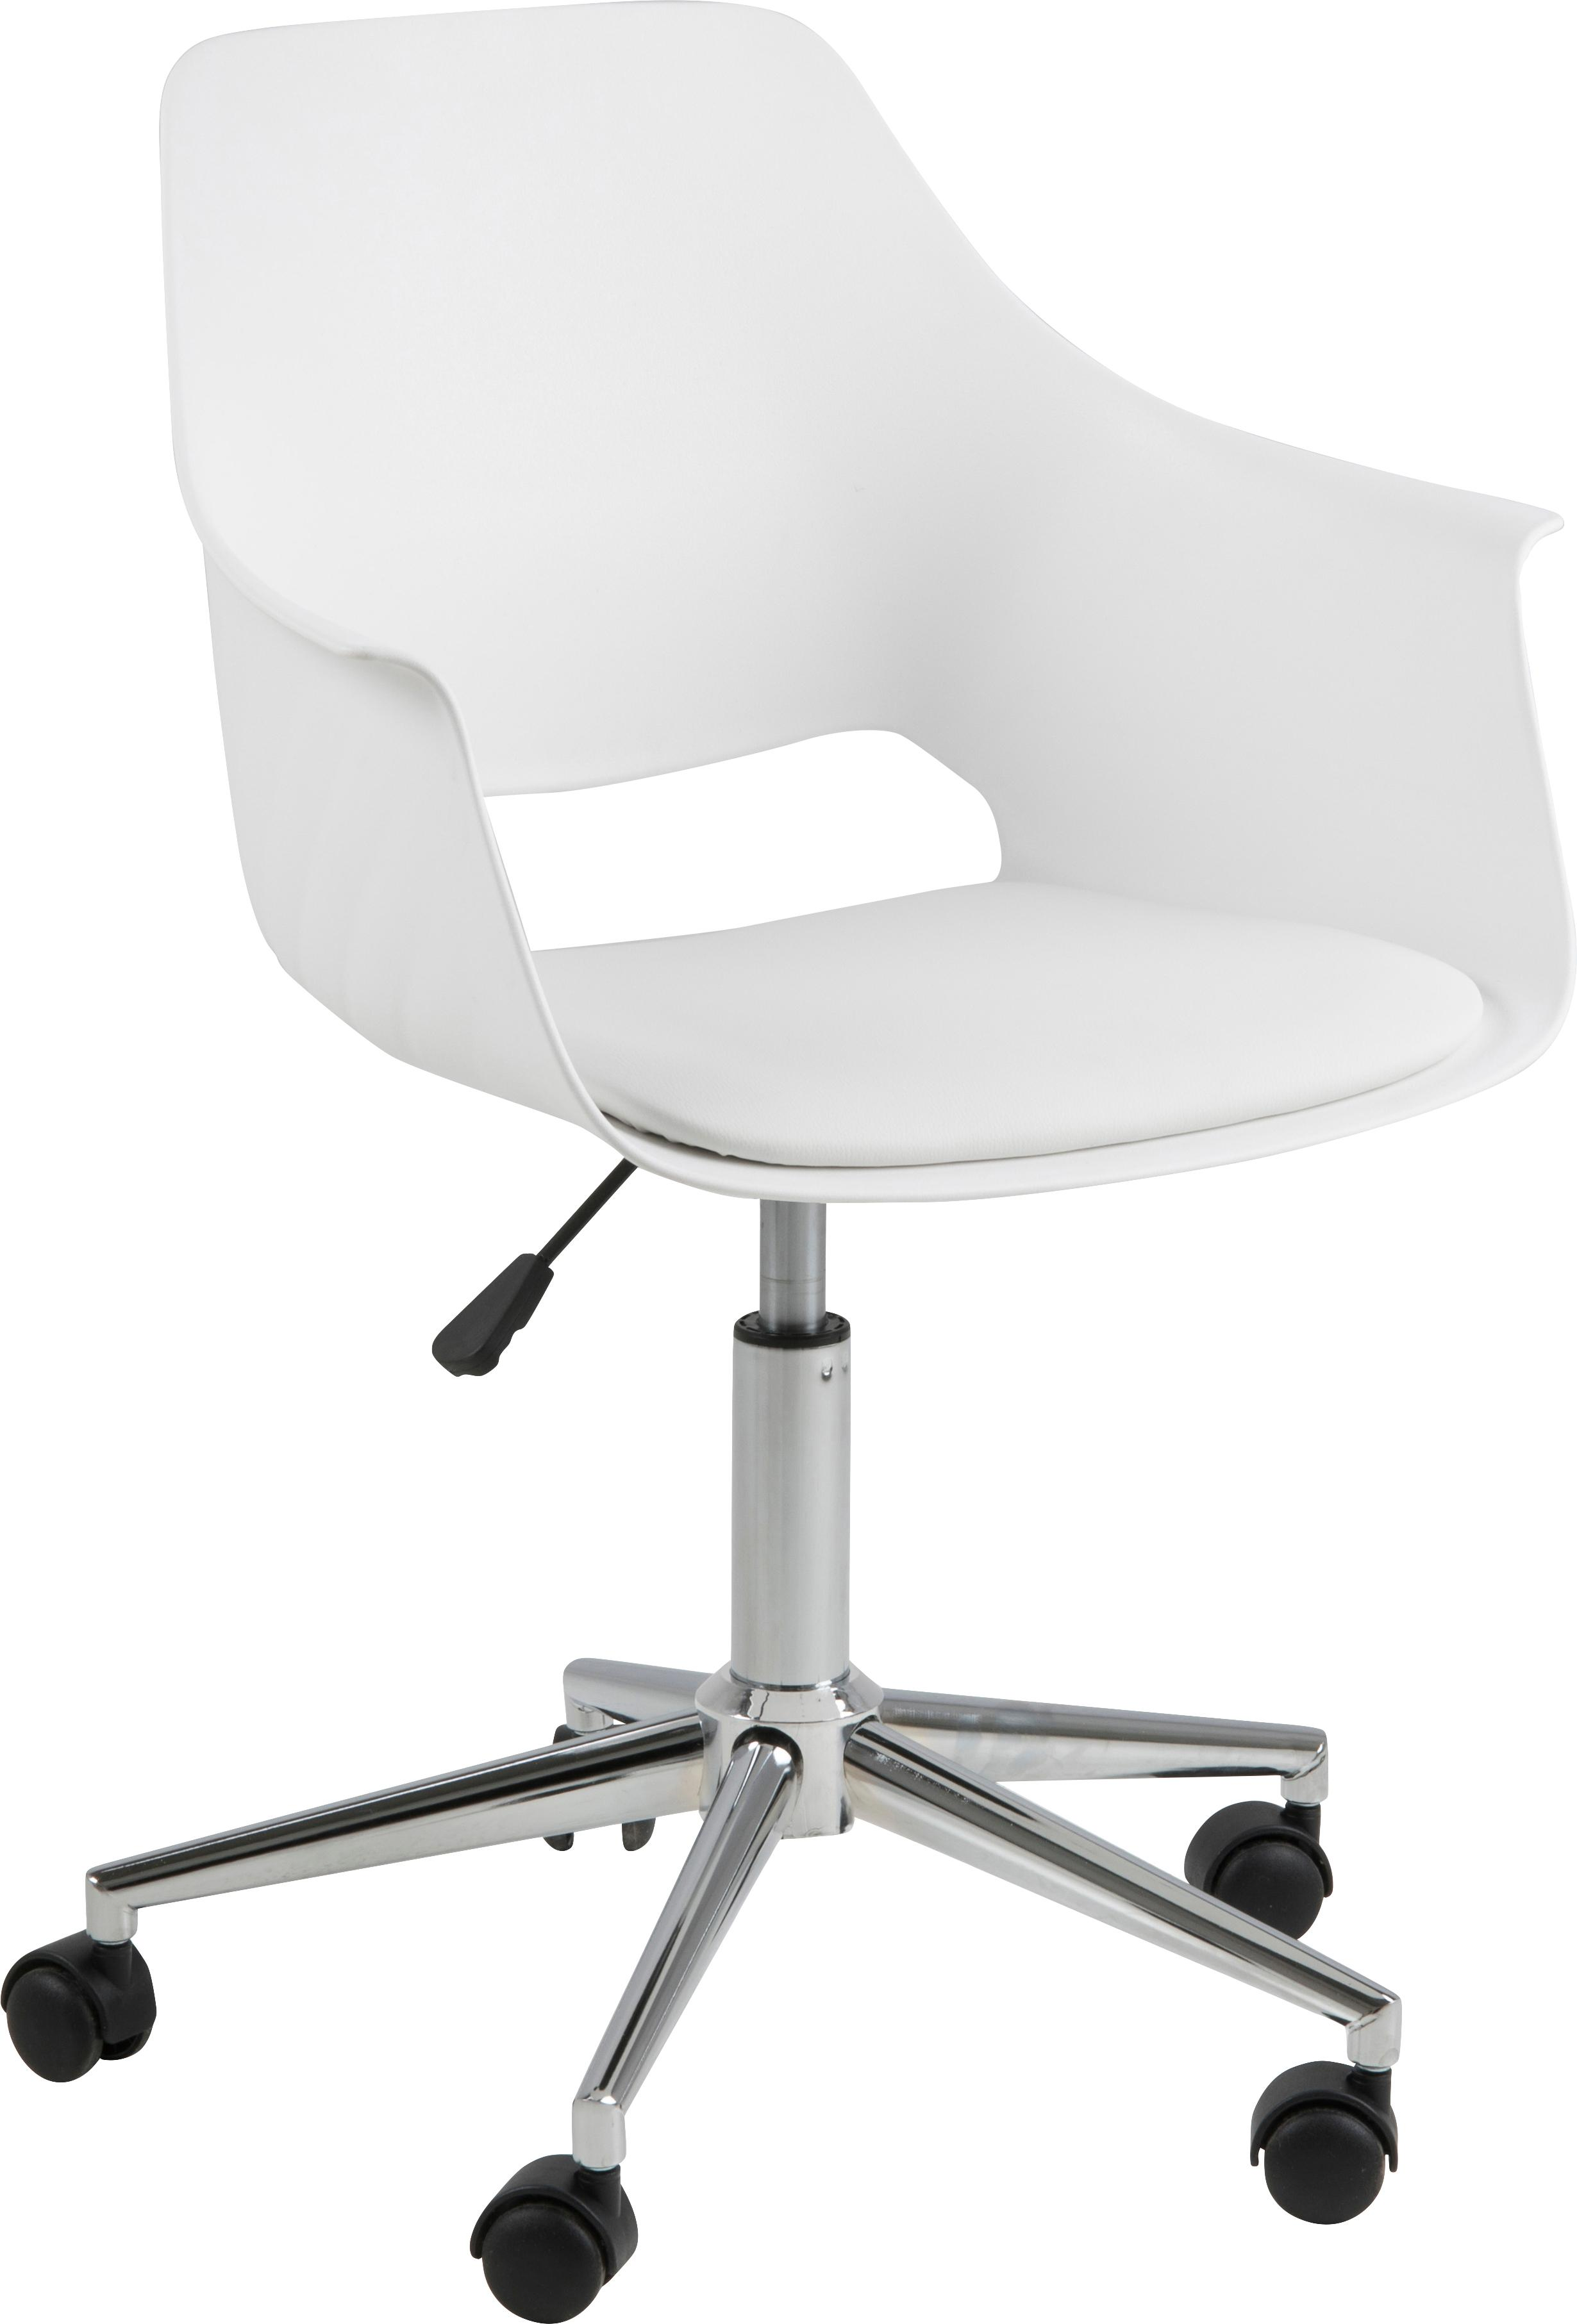 Silla giratoria de oficina Ramona, altura regulable, Patas: metal, cromado, Blanco, An 57 x F 53 cm